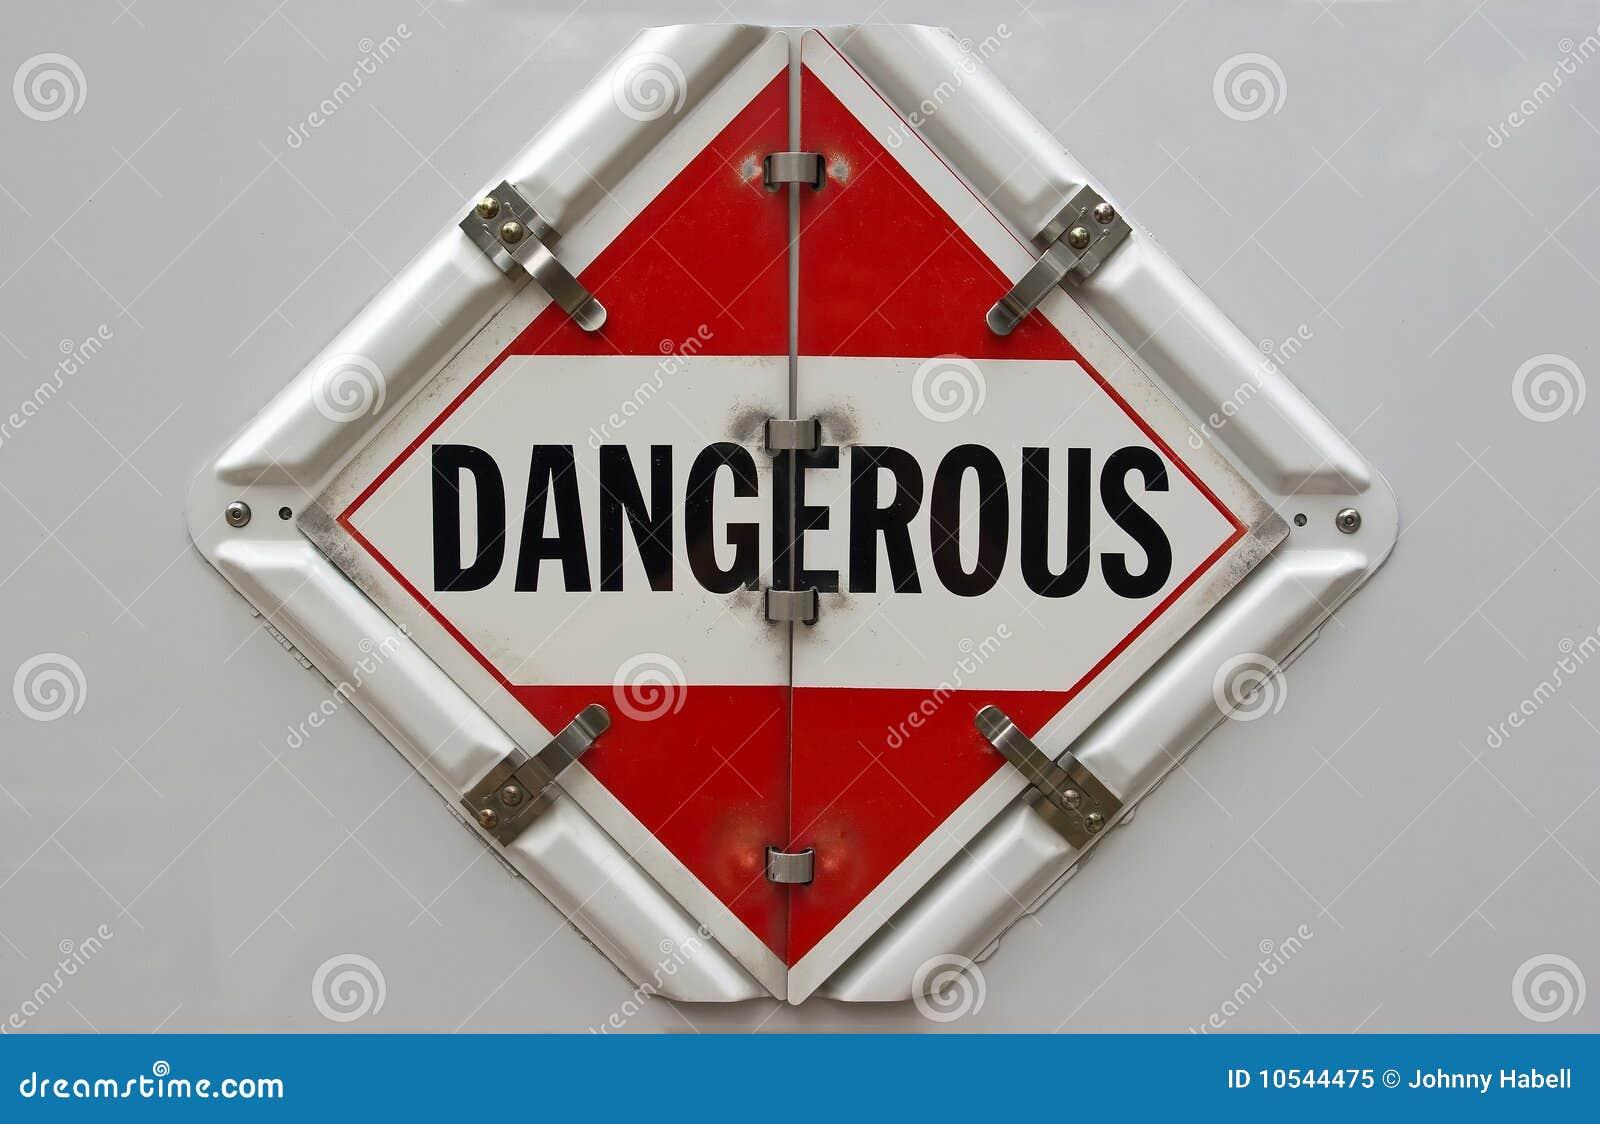 Dangerous Placard Royalty Free Stock Photo Image 10544475